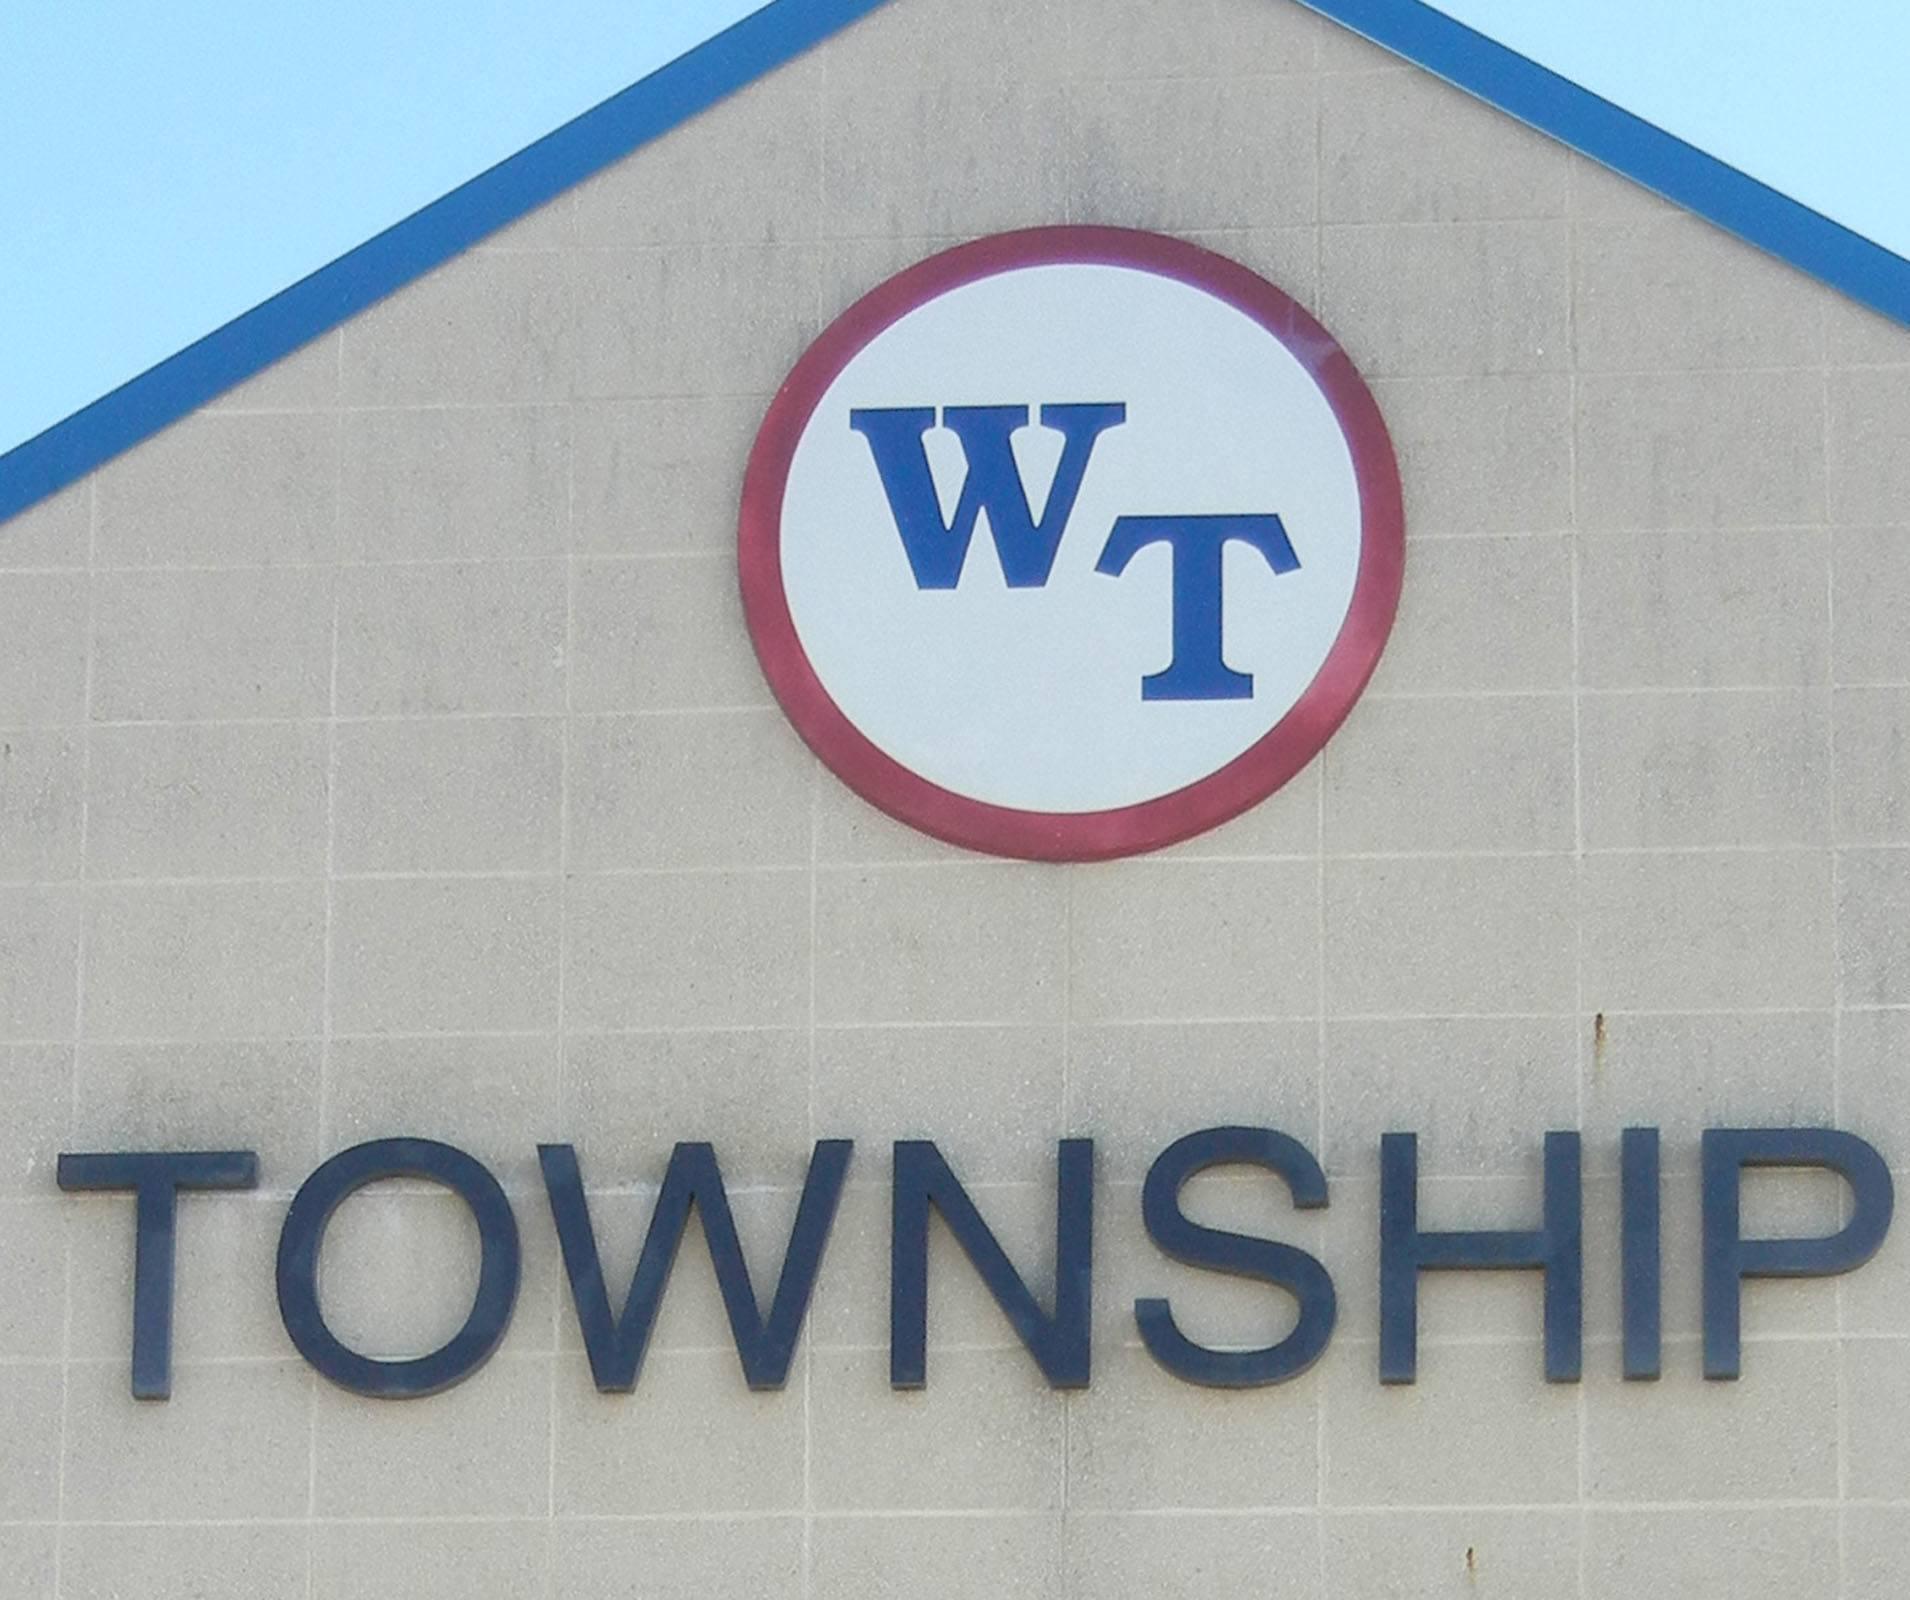 Washington Township Public Schools / Calendar